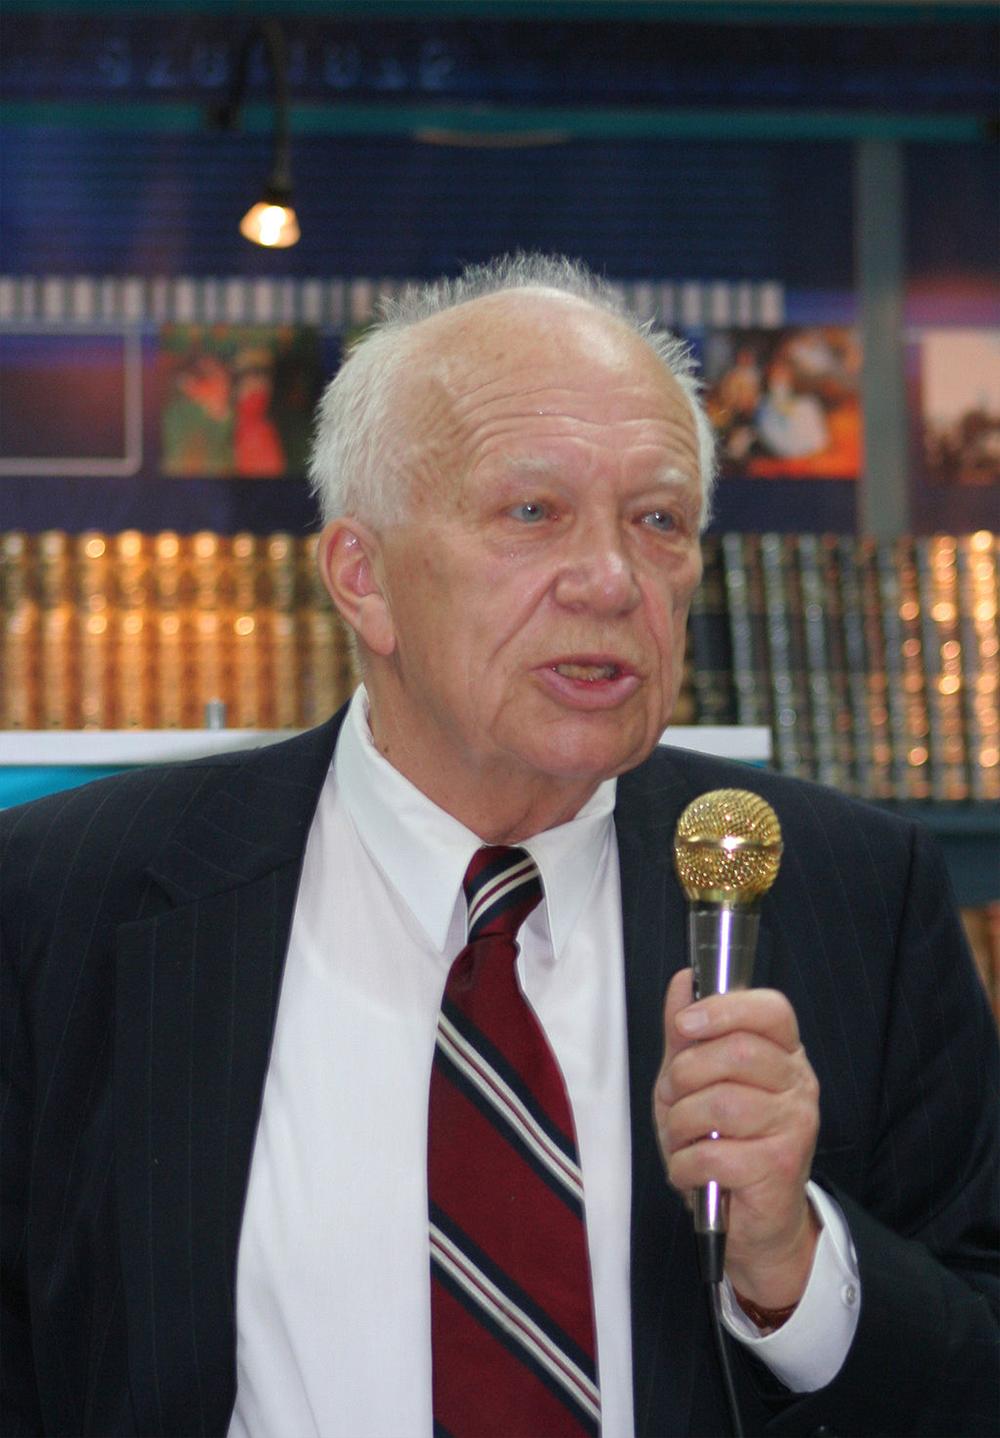 Sergei Khrushchev, 2010. Photograph by A. Savin.